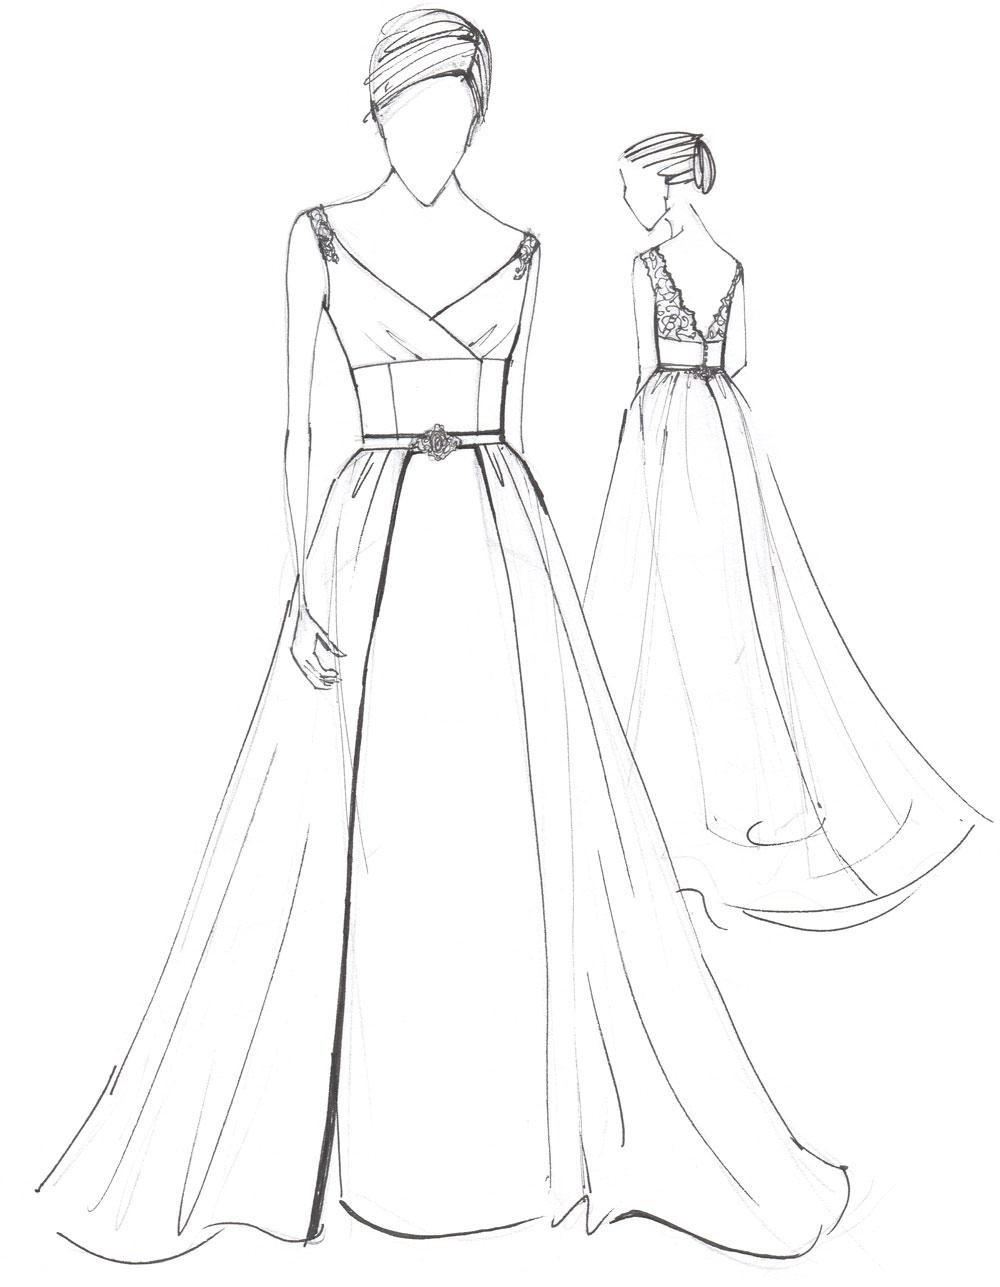 rachel lamb dress design